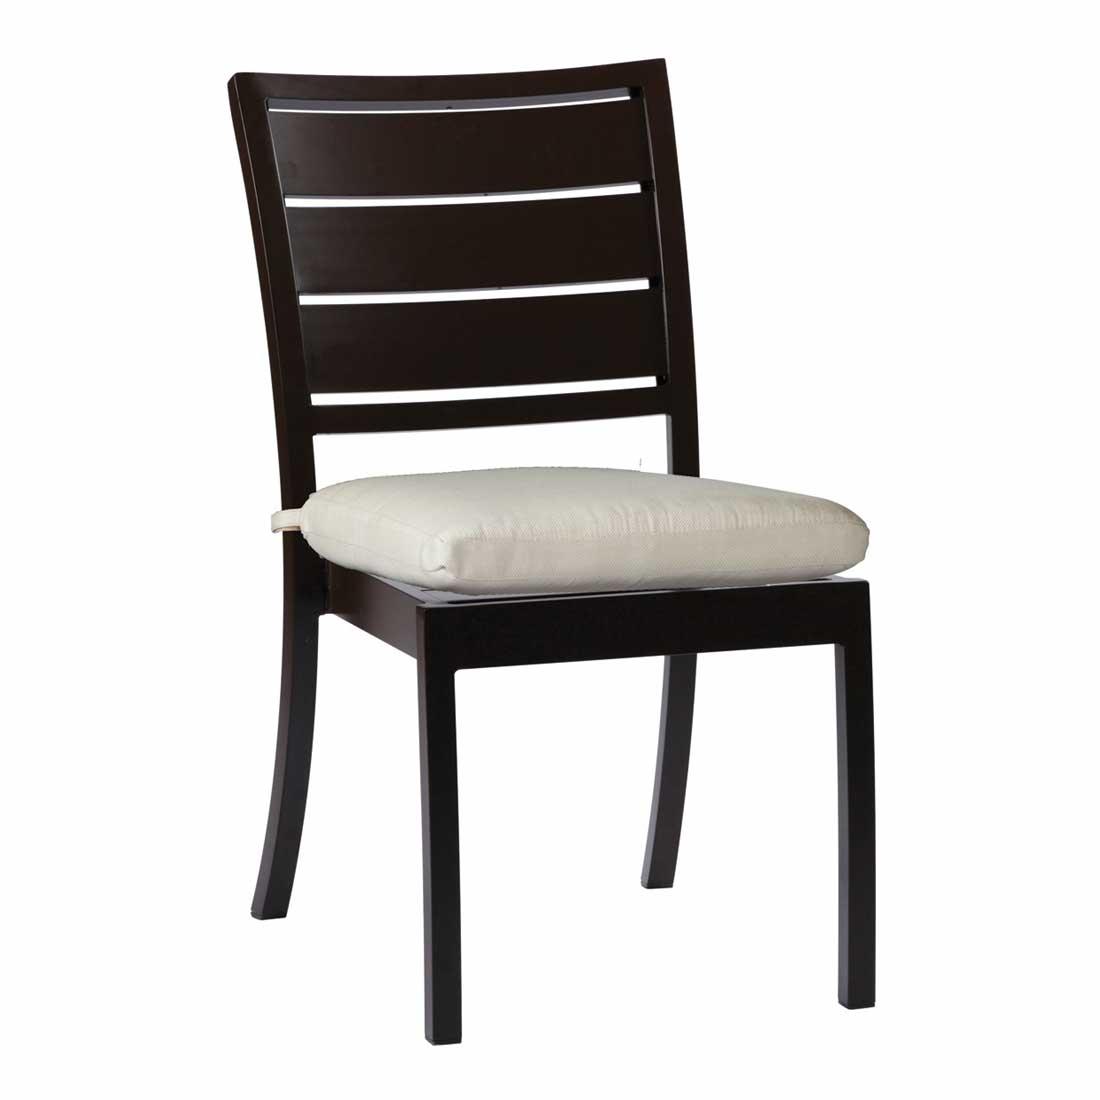 charleston aluminum side chair - Dimensions: W19.75 D28.5 H35.88